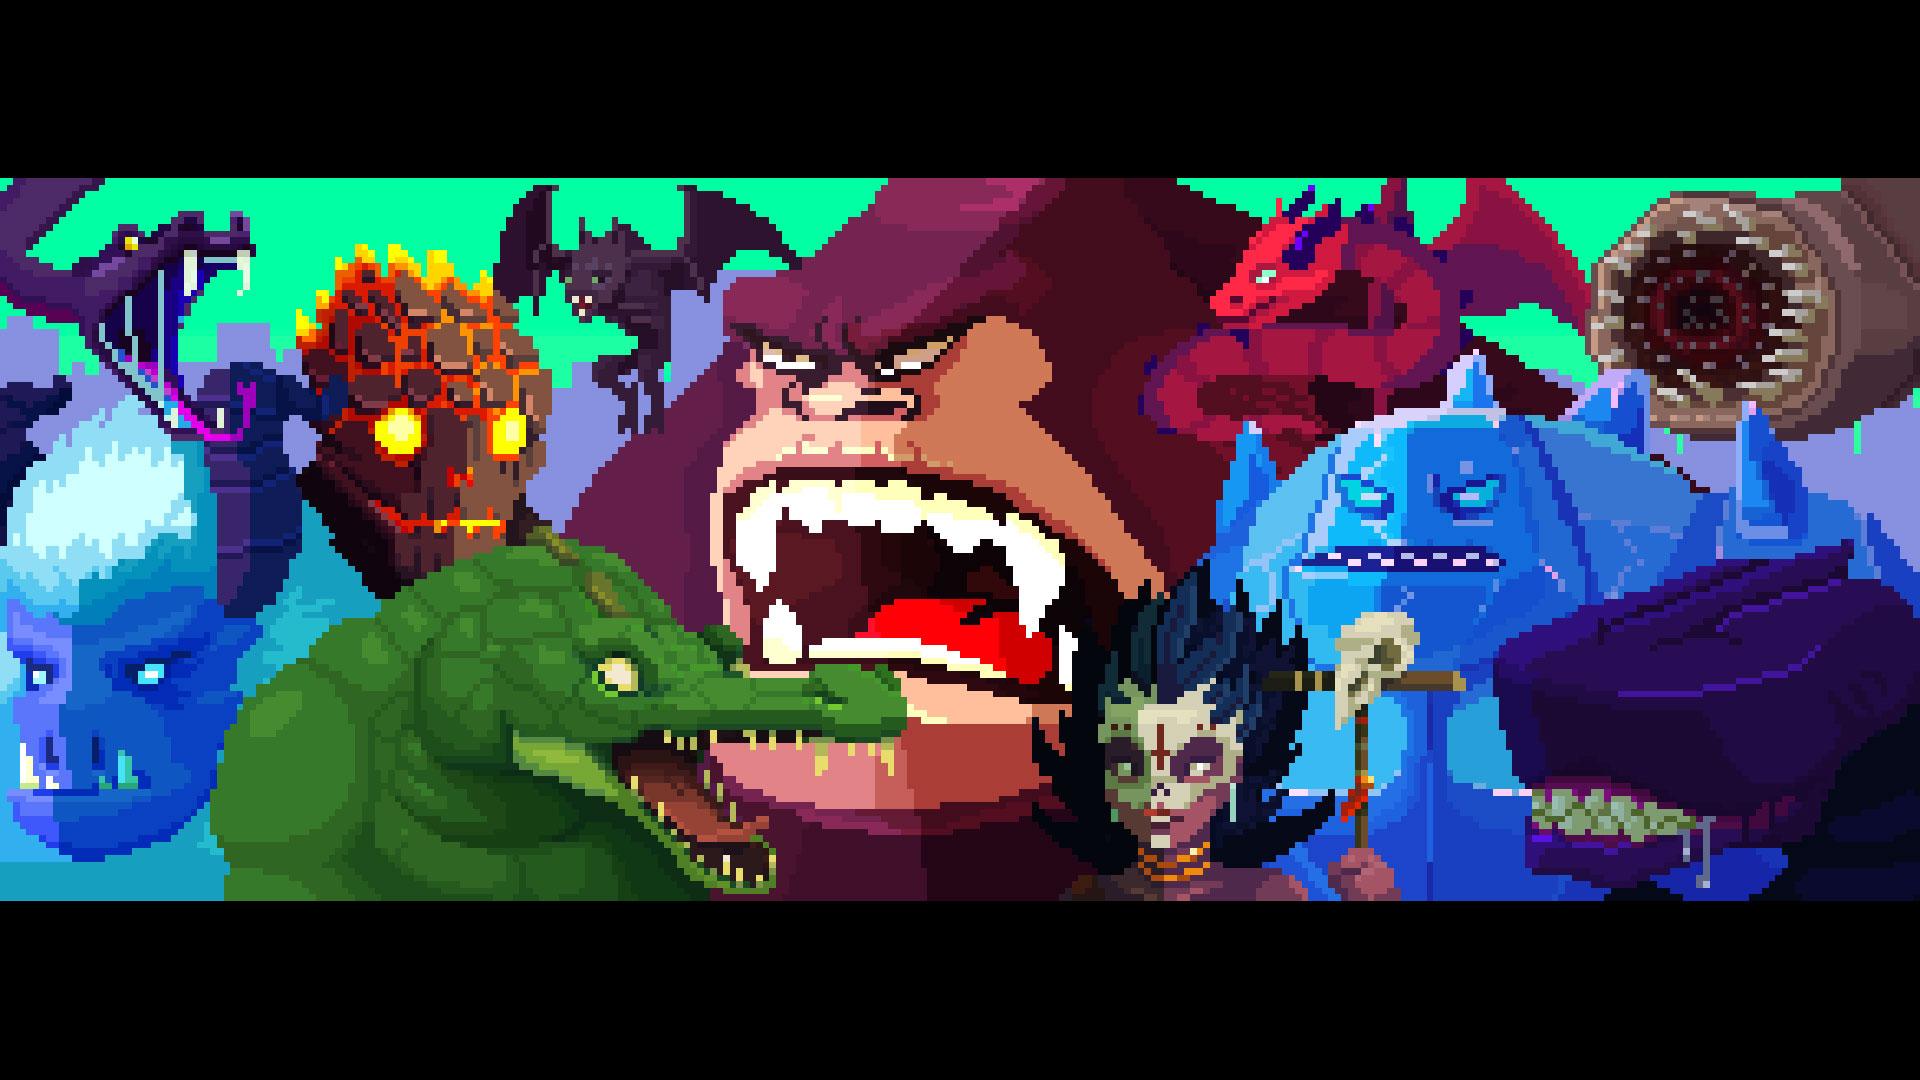 Hero Express Отзывы - GameSpace.com 2